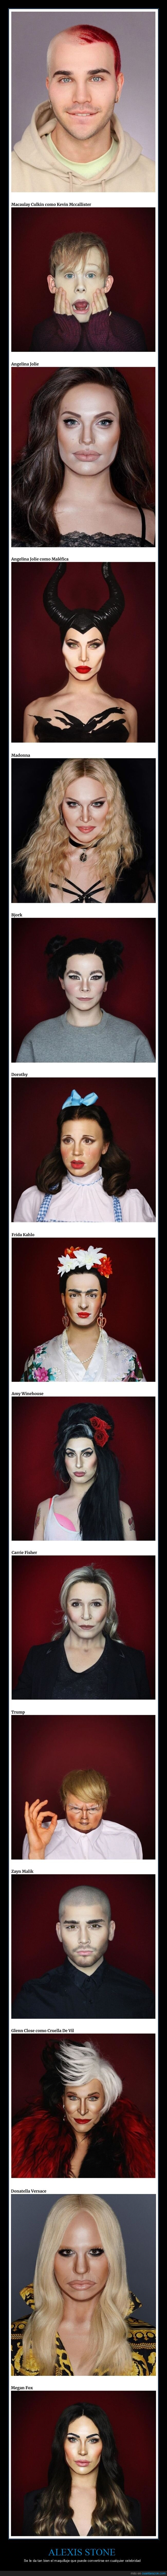 alexis stone,famosos,maquillaje